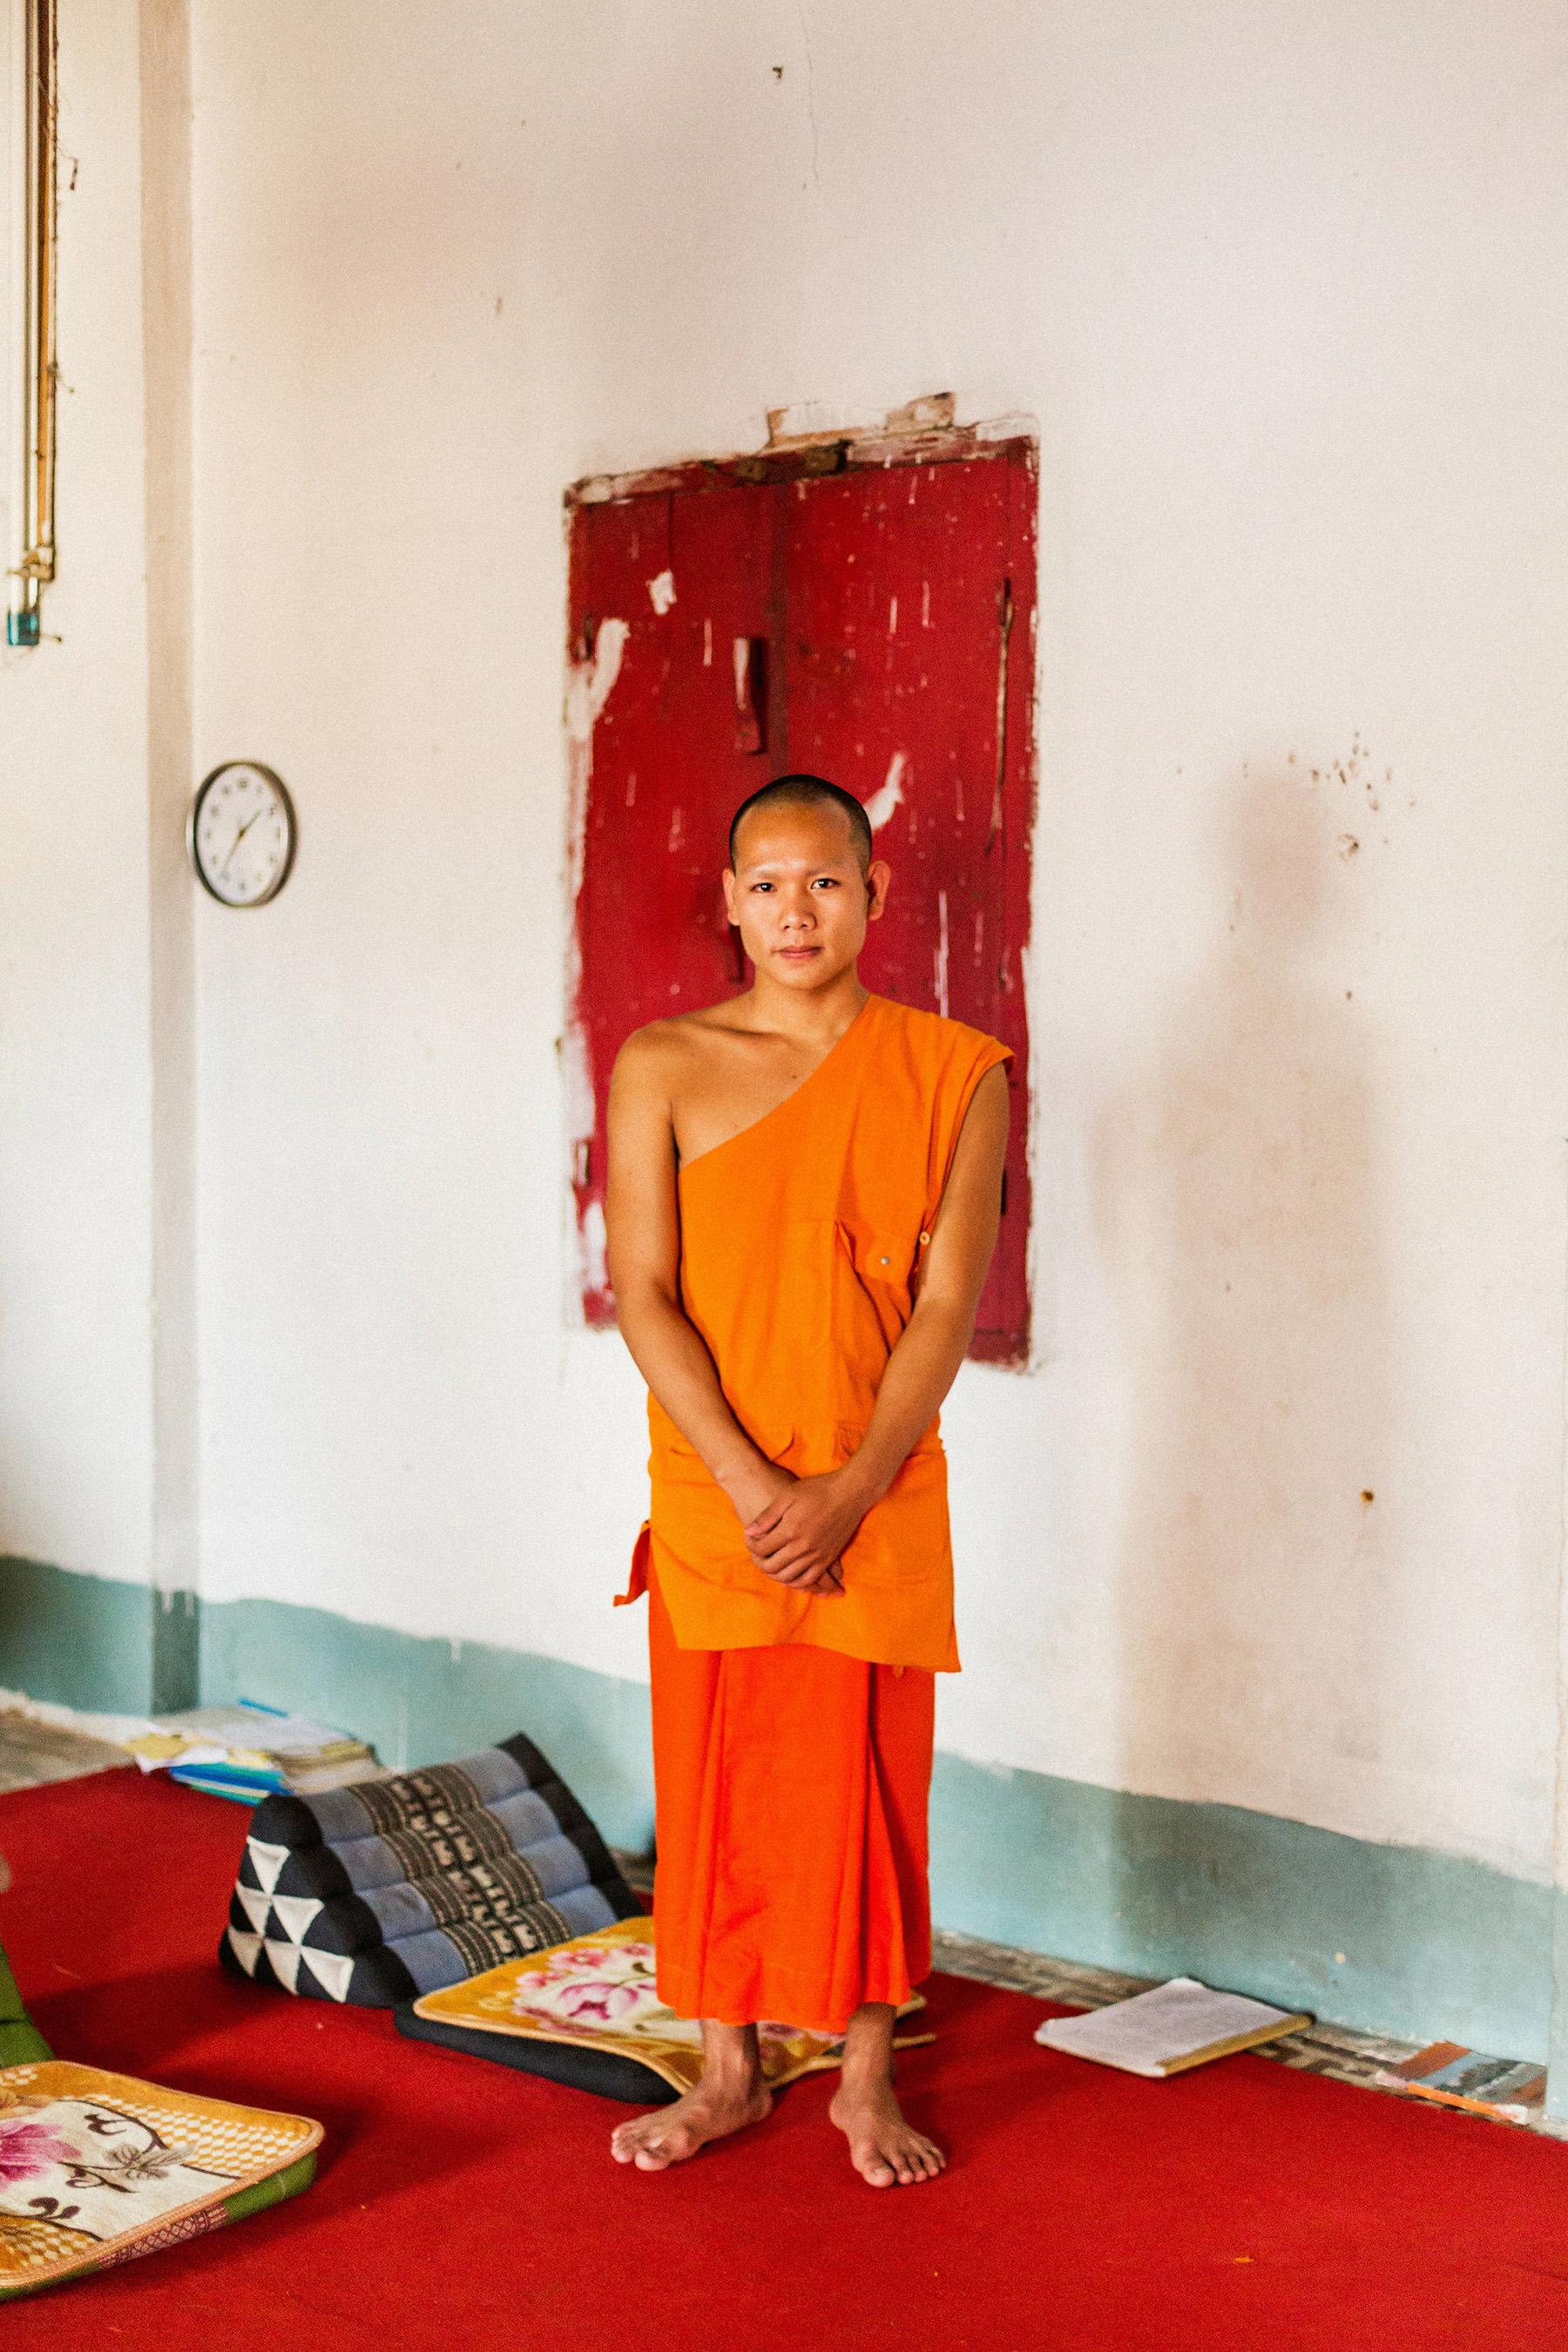 Laos Street Photographer